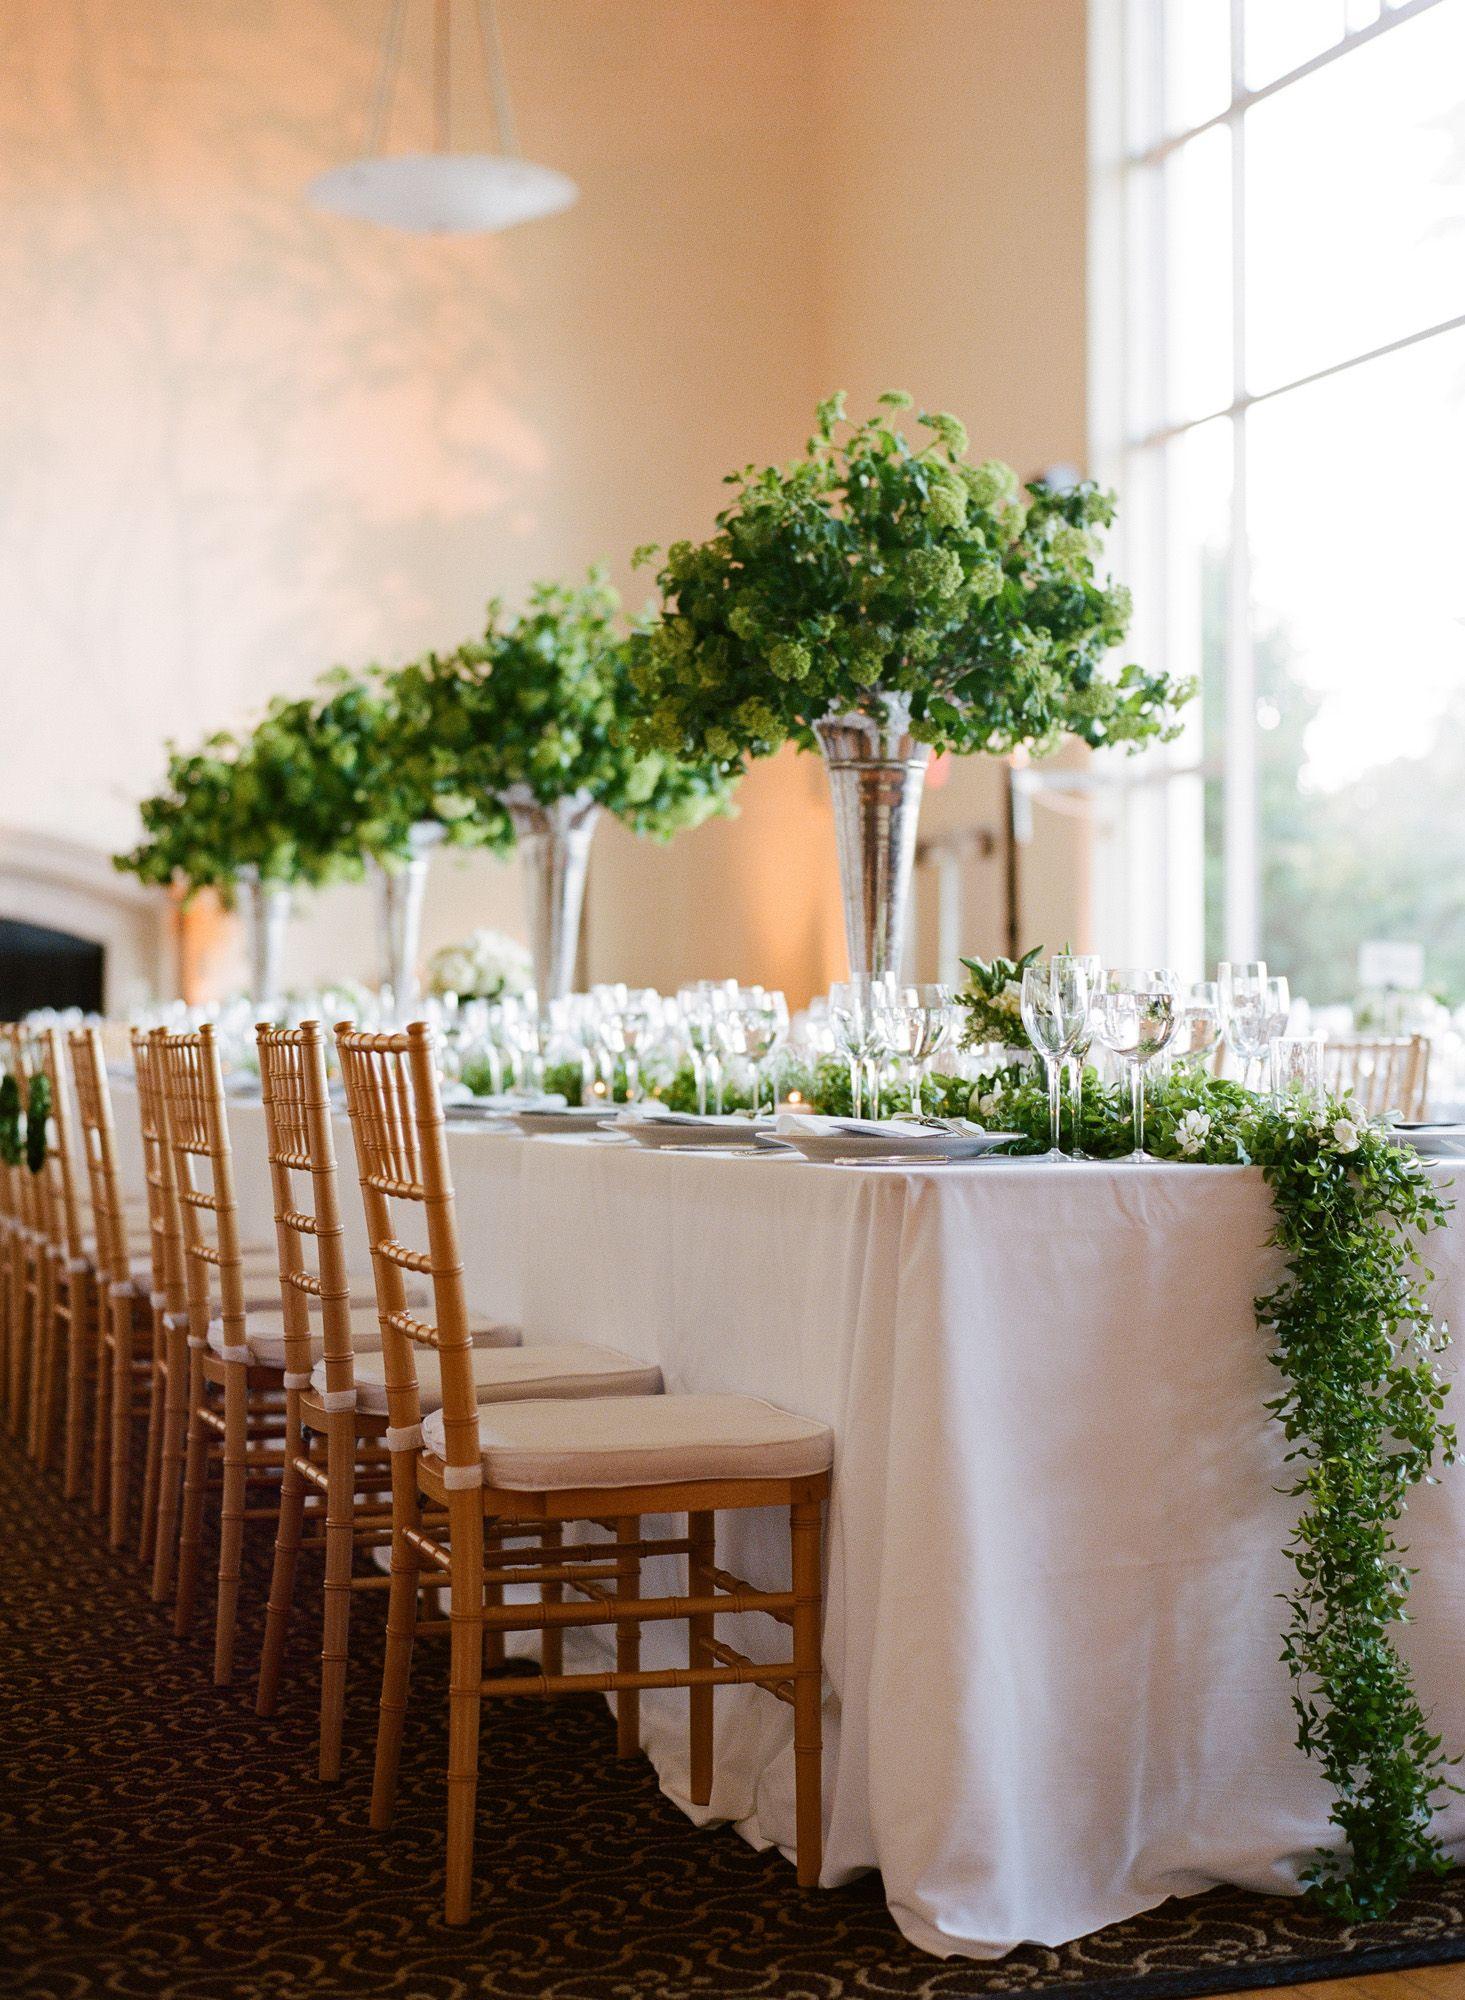 15 Best Greenery Wedding Centerpieces